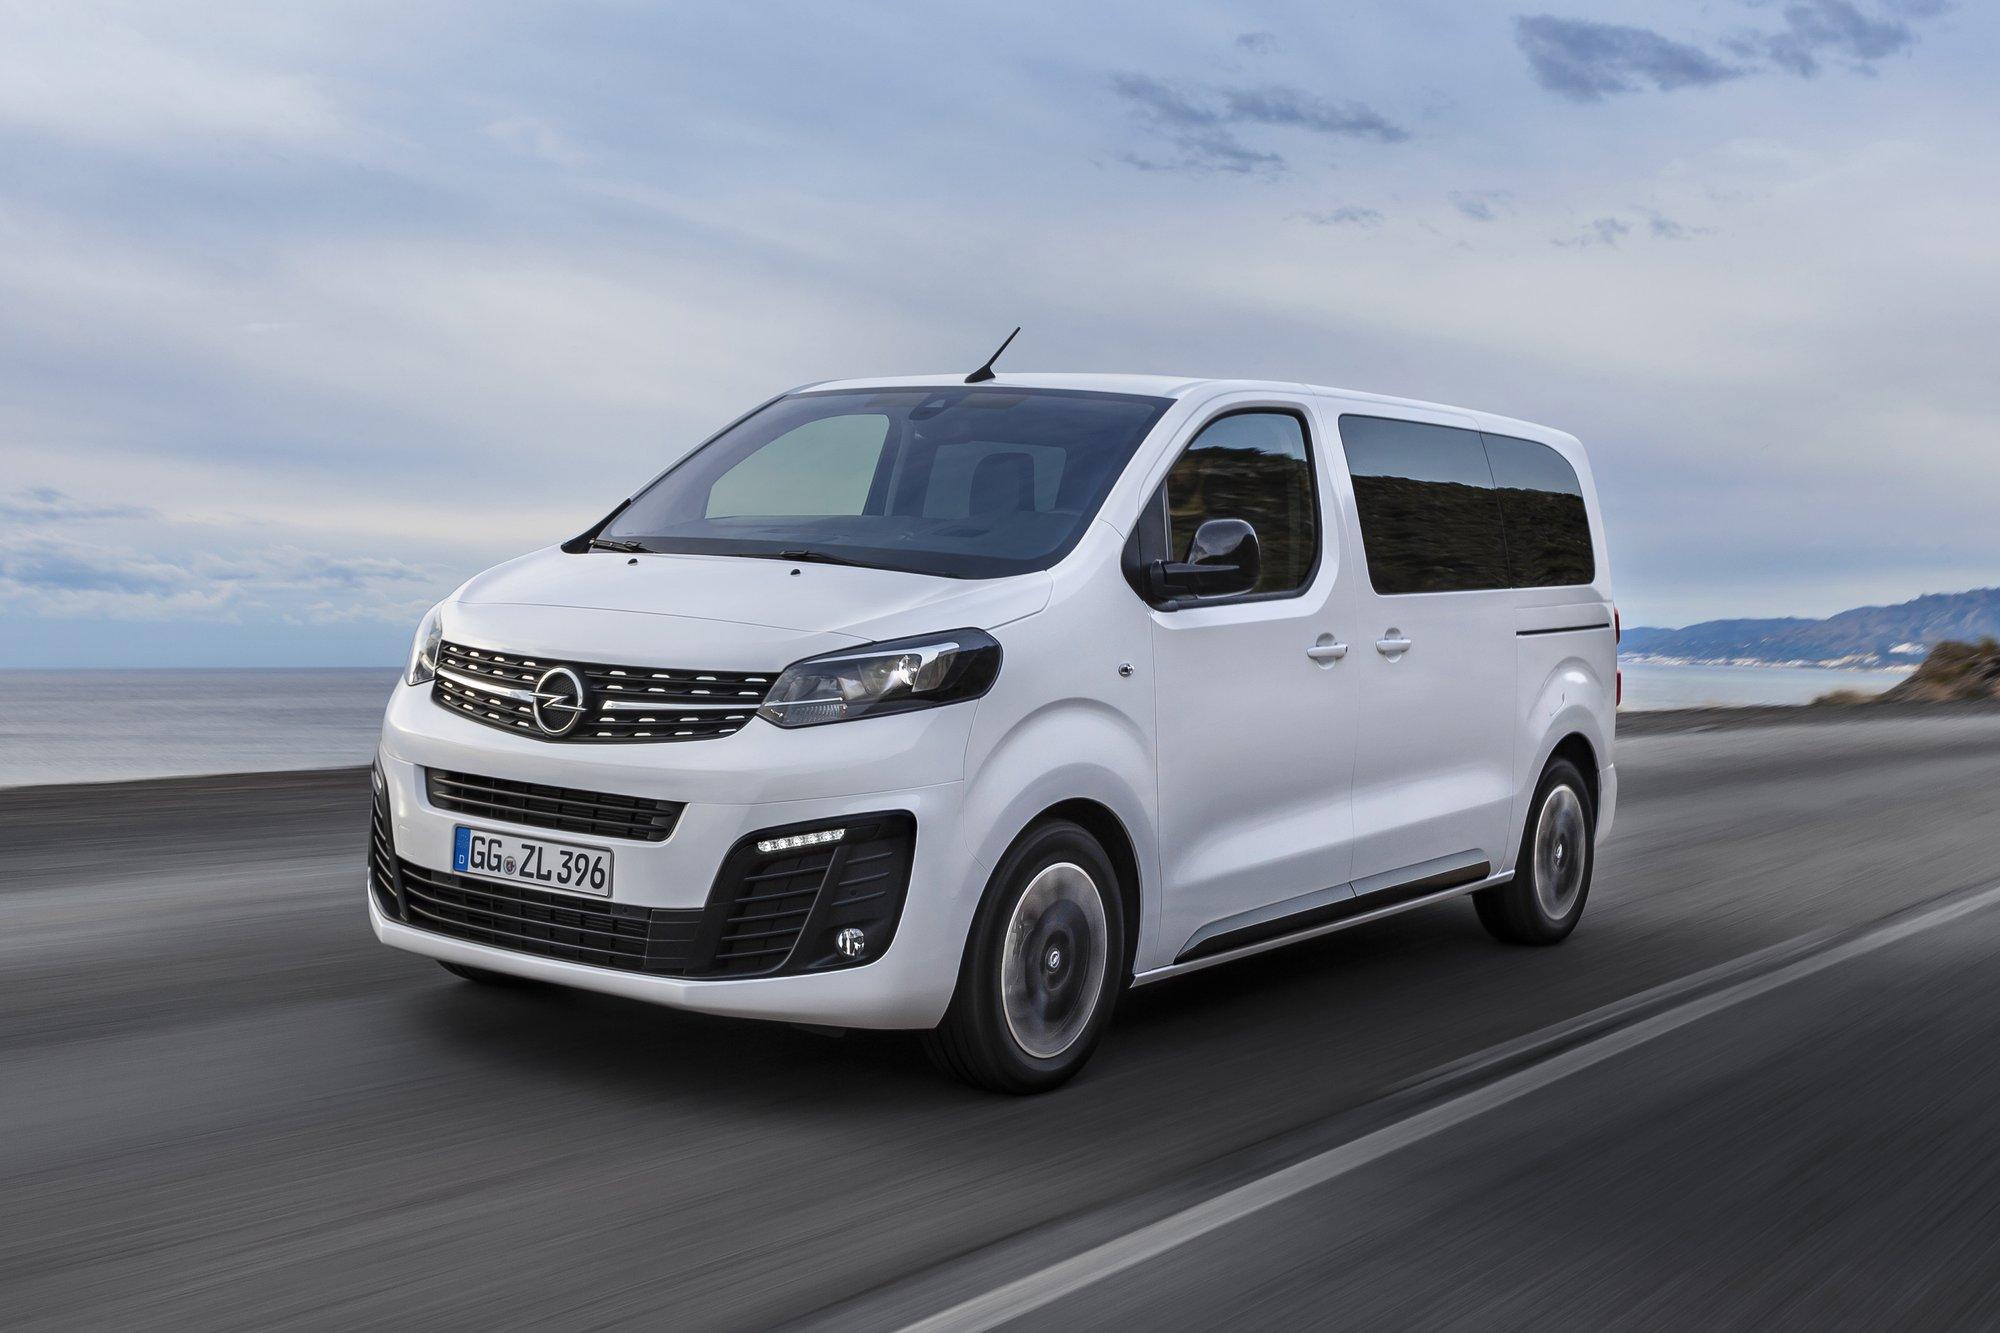 2020 Opel Vivaro Performance